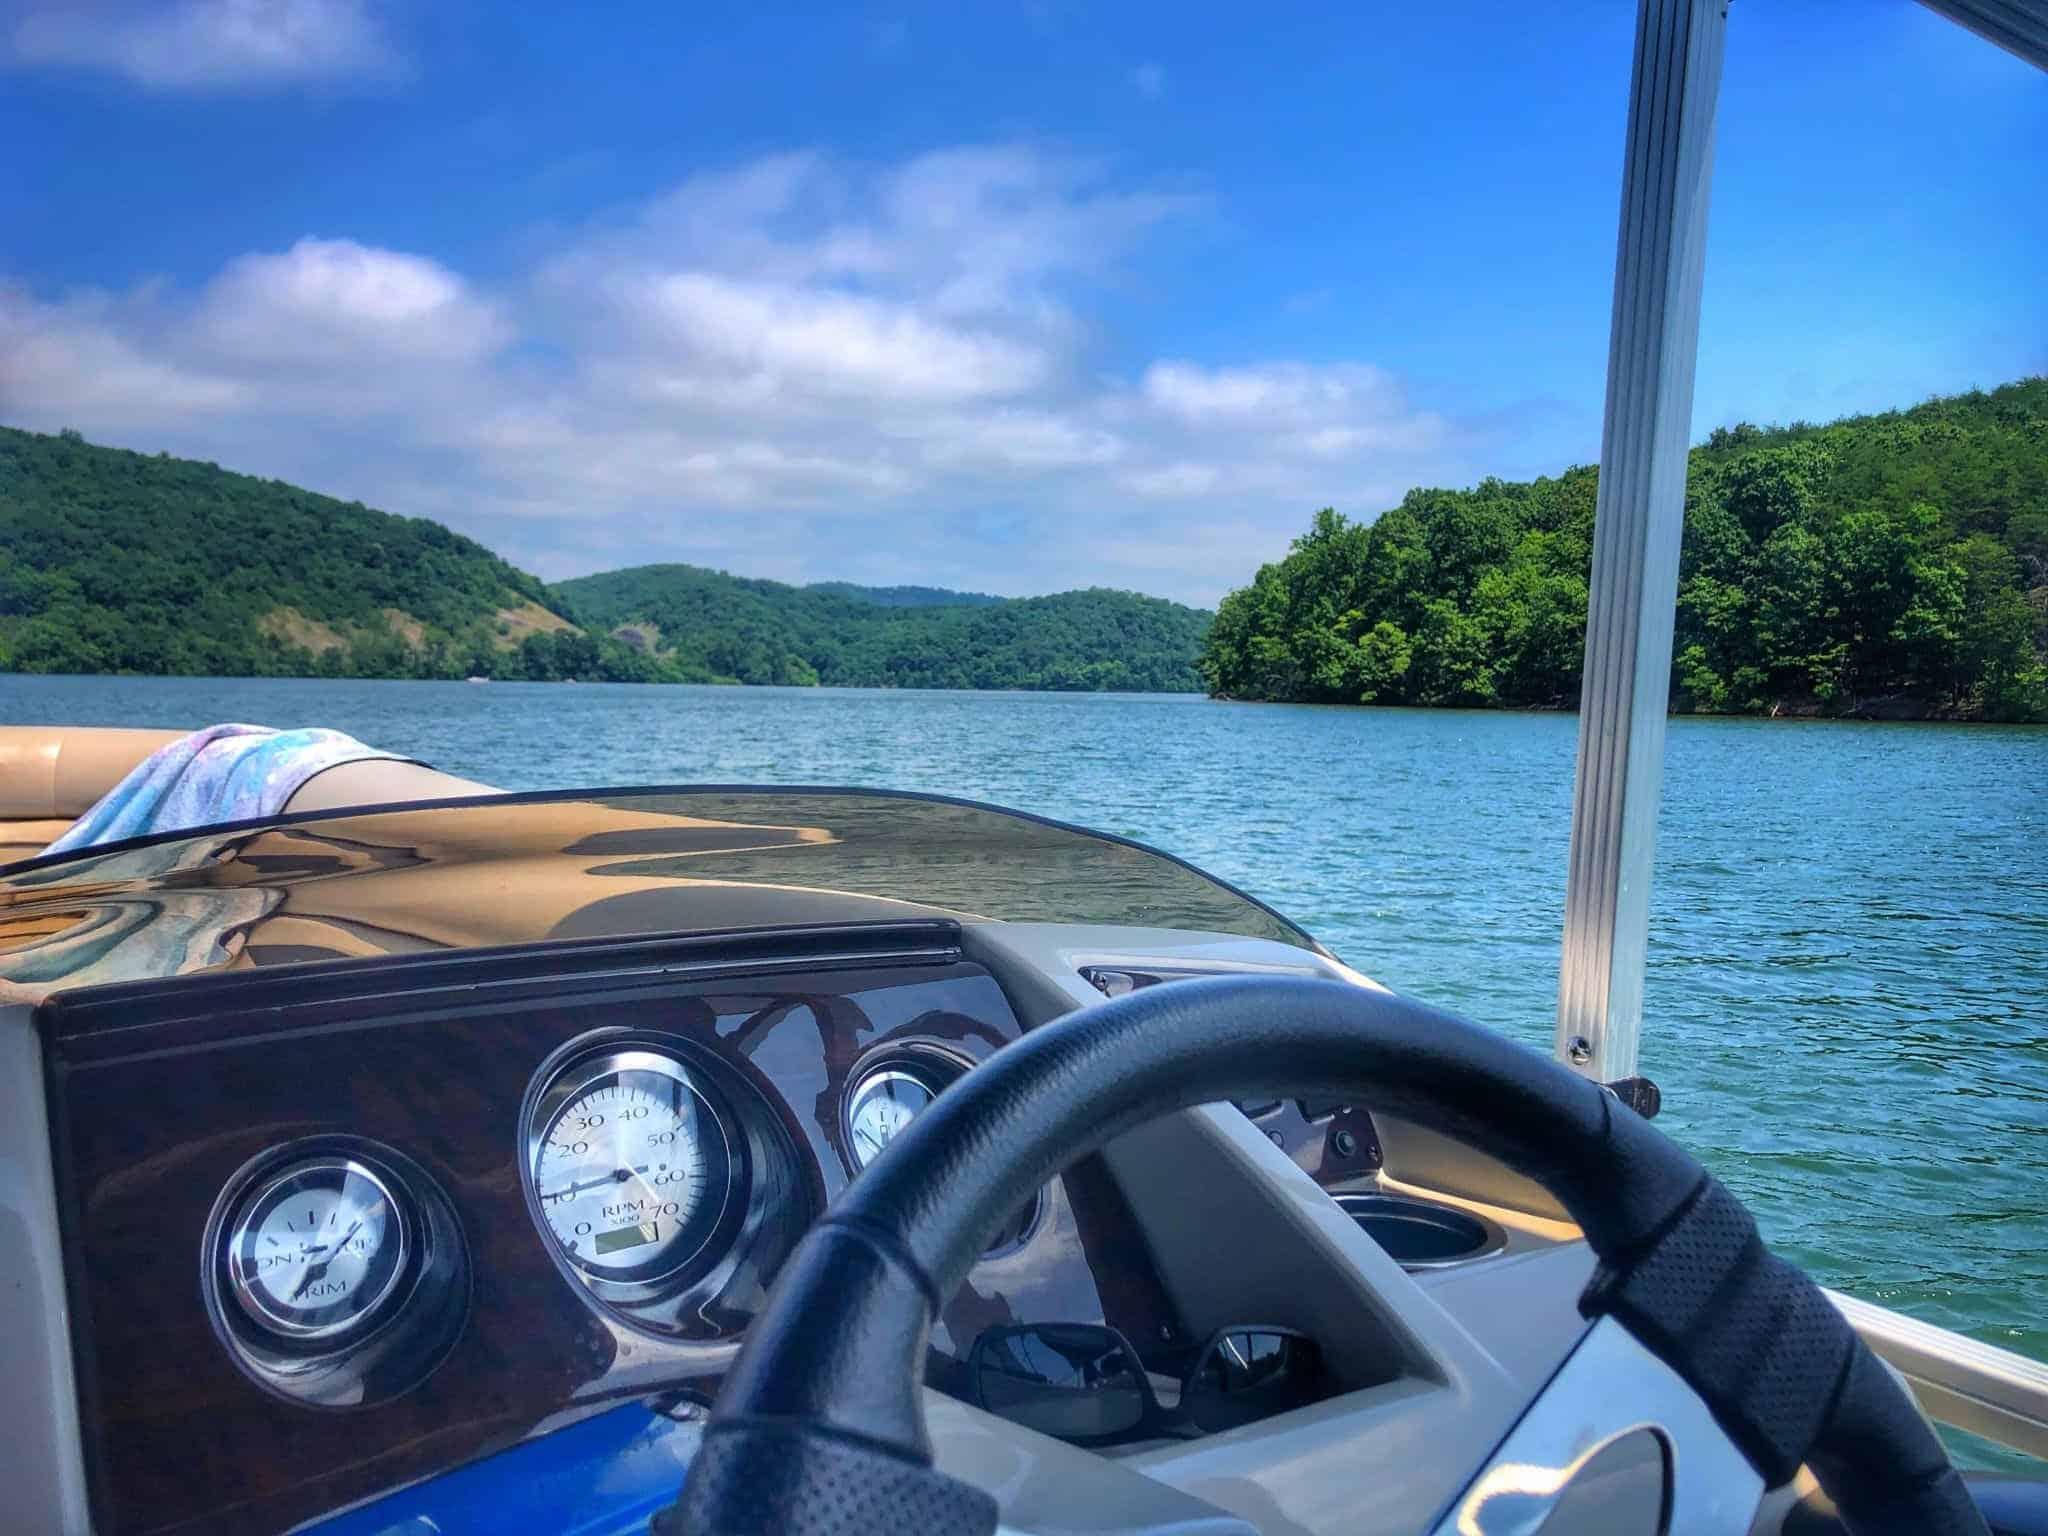 do you need a license to drive a pontoon boat